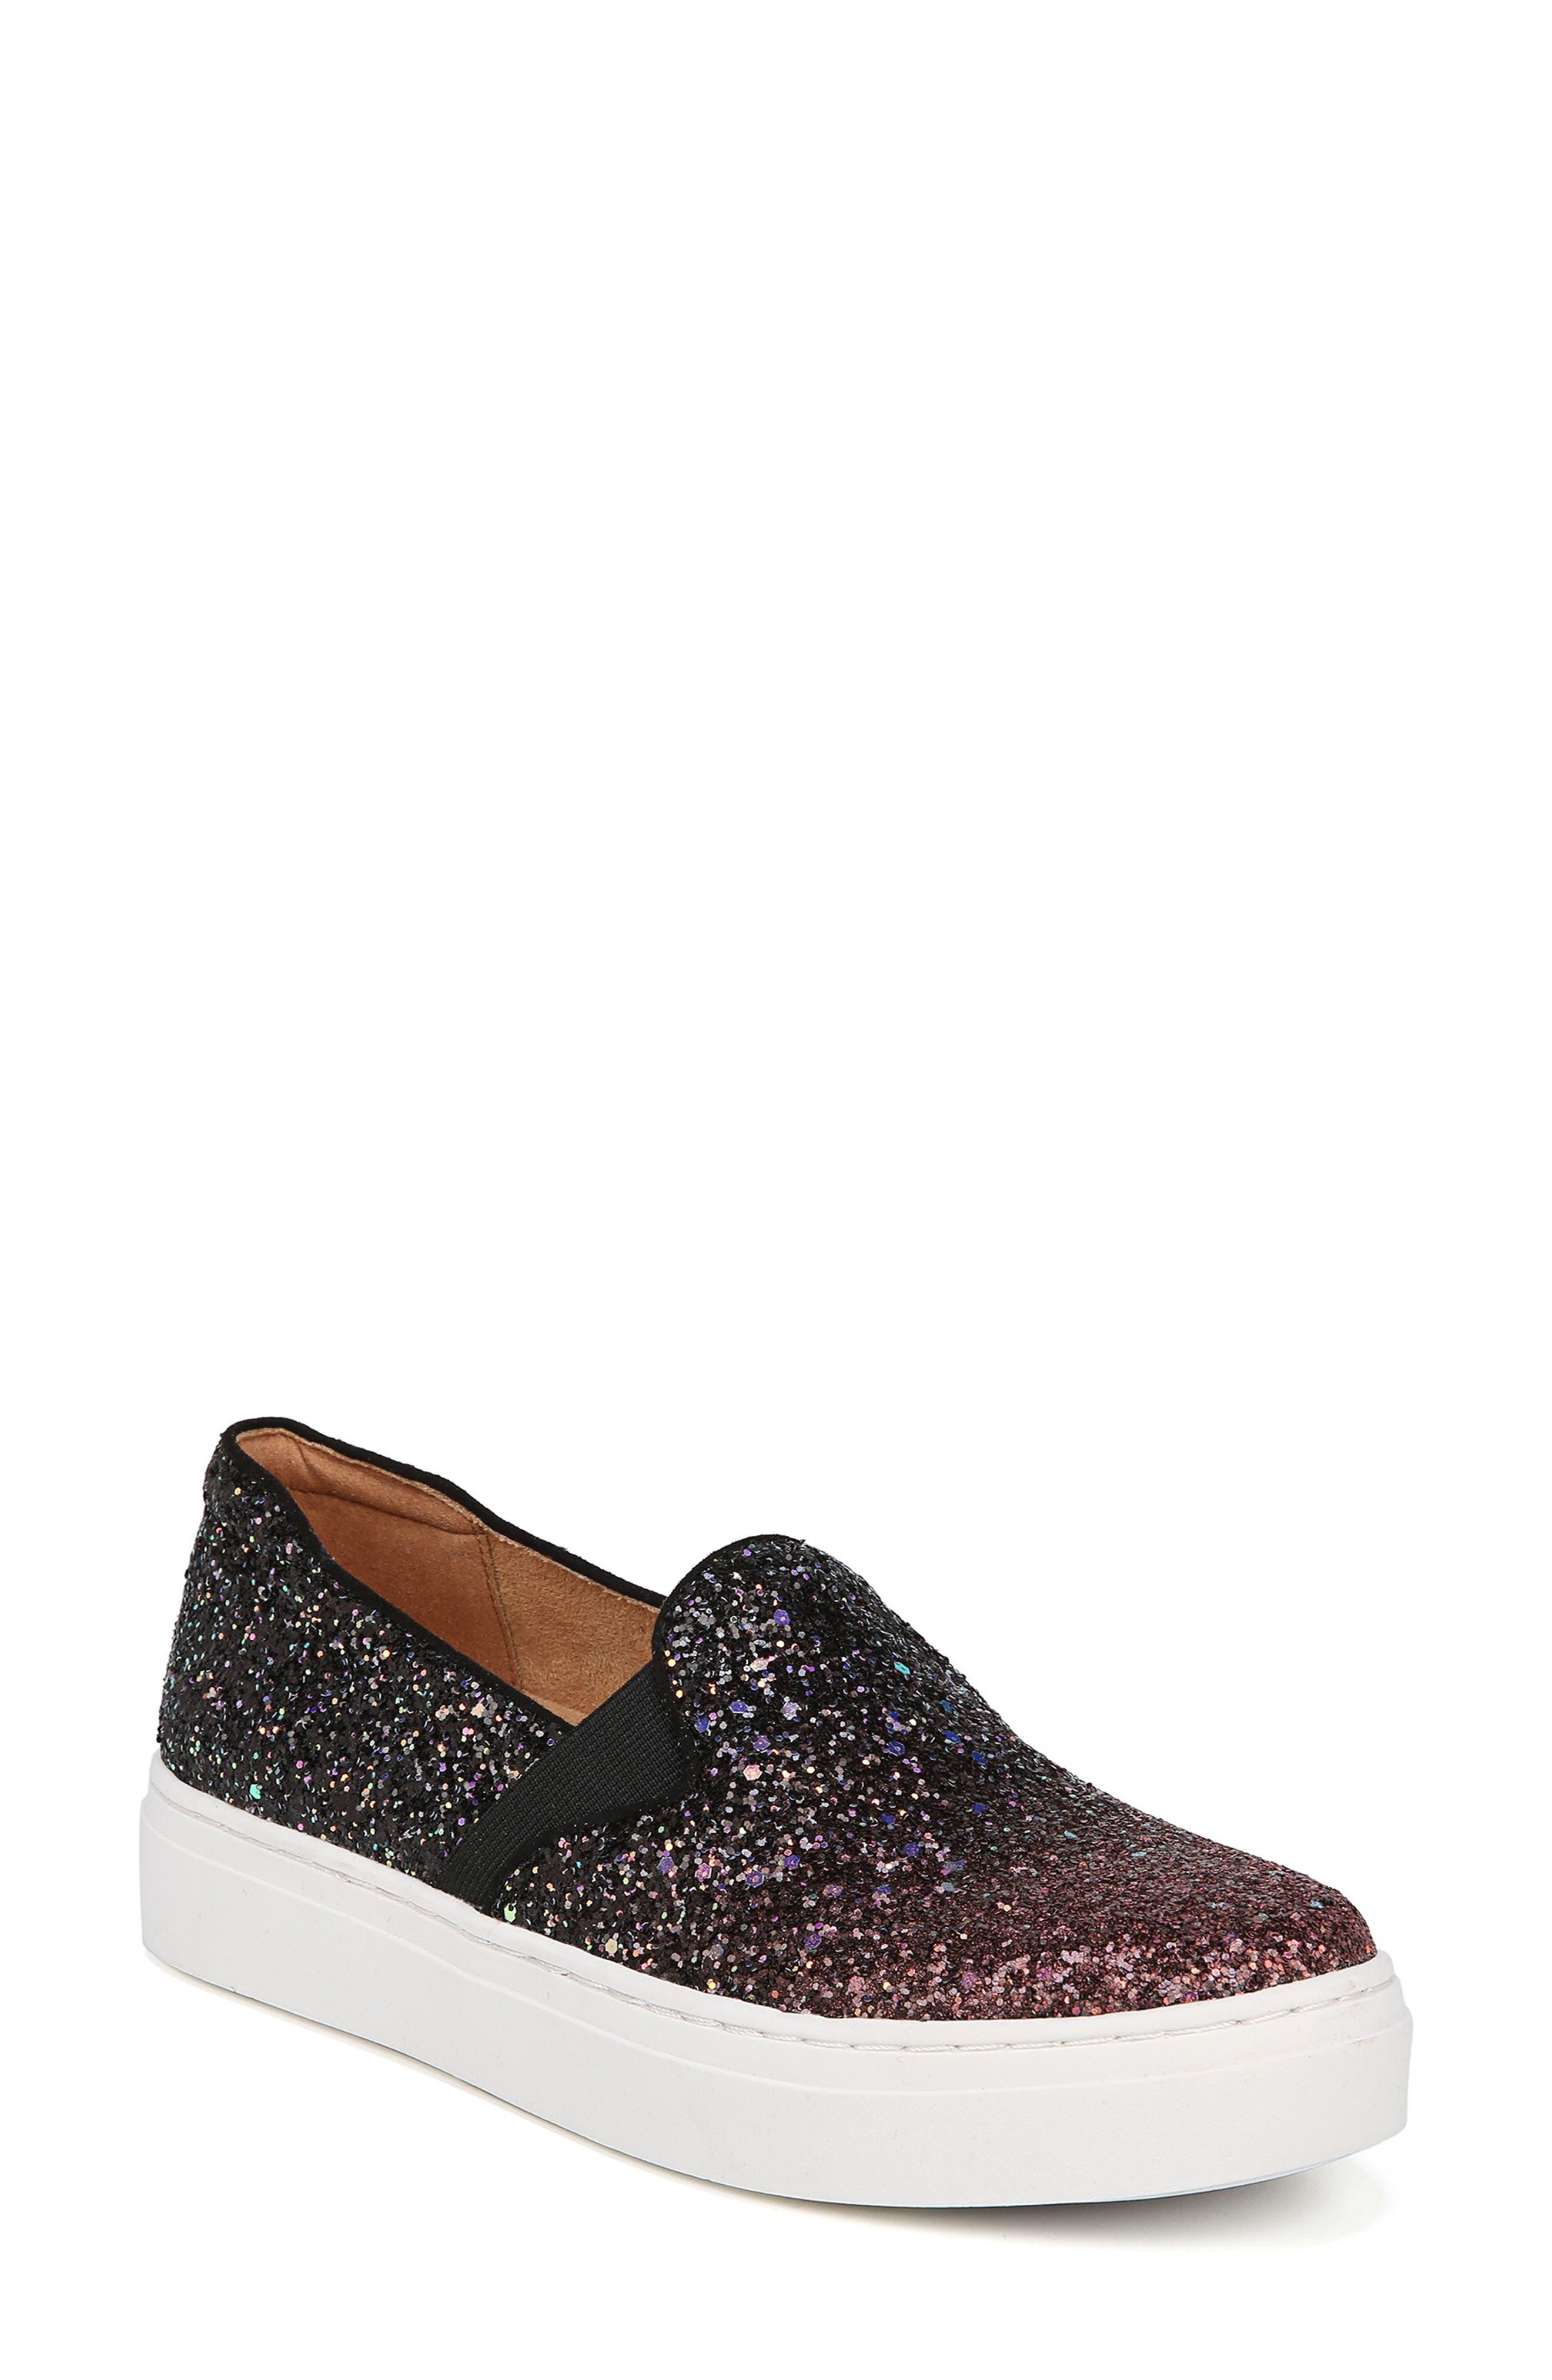 NATURALIZER, Carly Slip-On Sneaker, Main thumbnail 1, color, MULTI GLITTER FABRIC